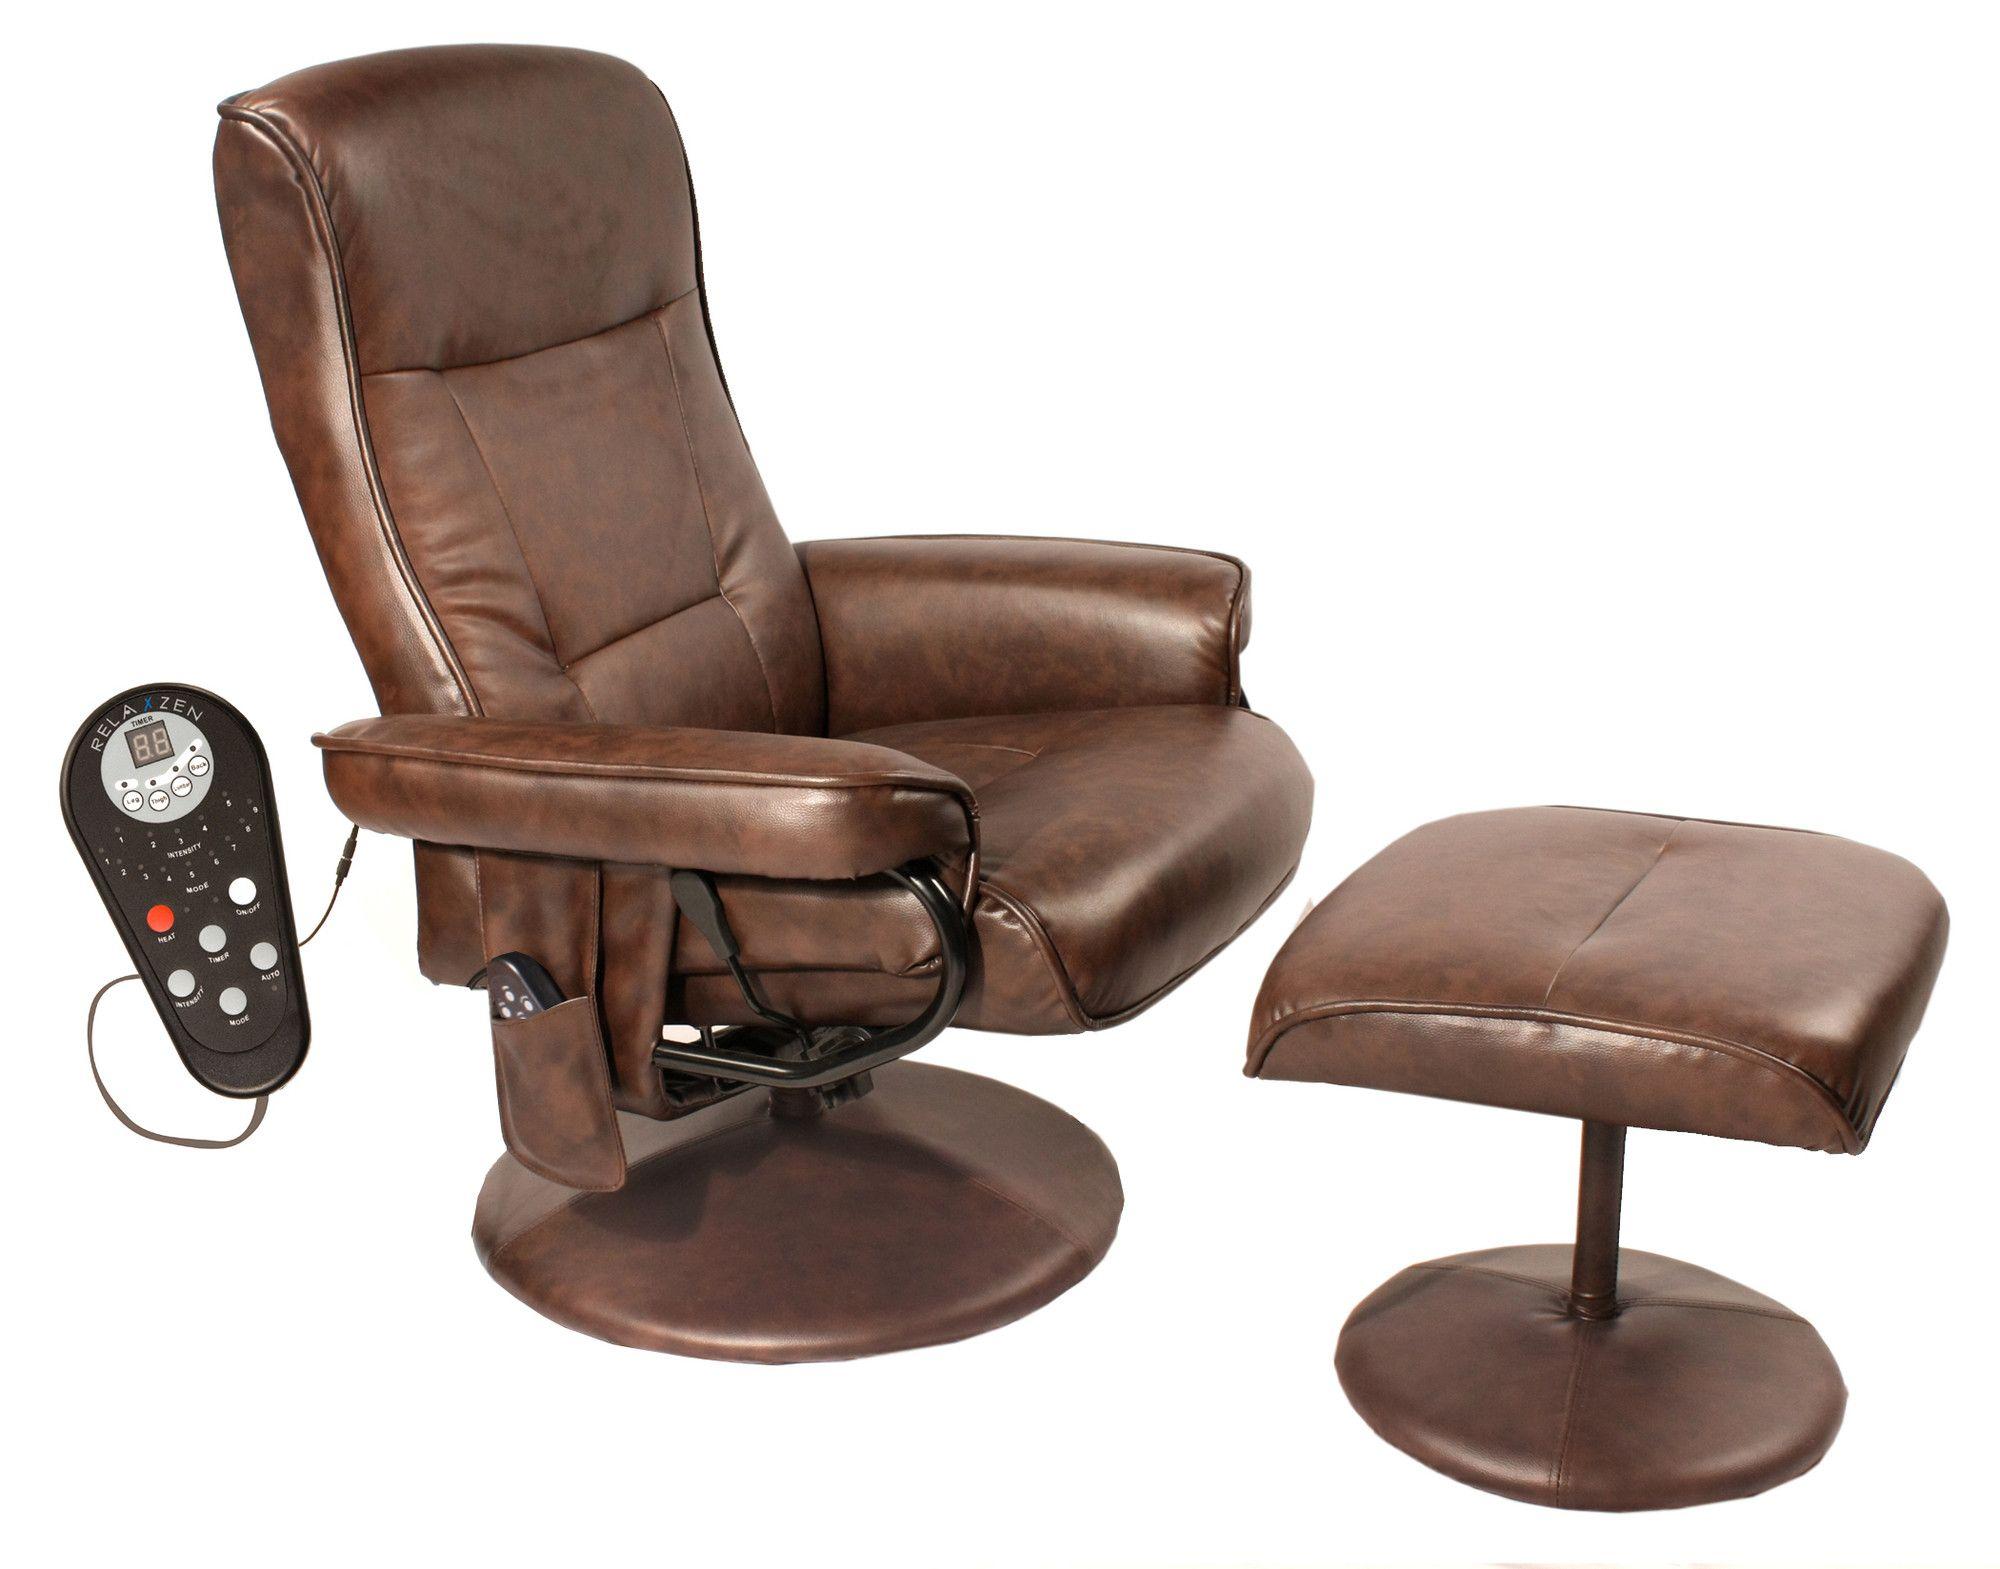 comfort products relaxzen leisure reclining heated massage chair